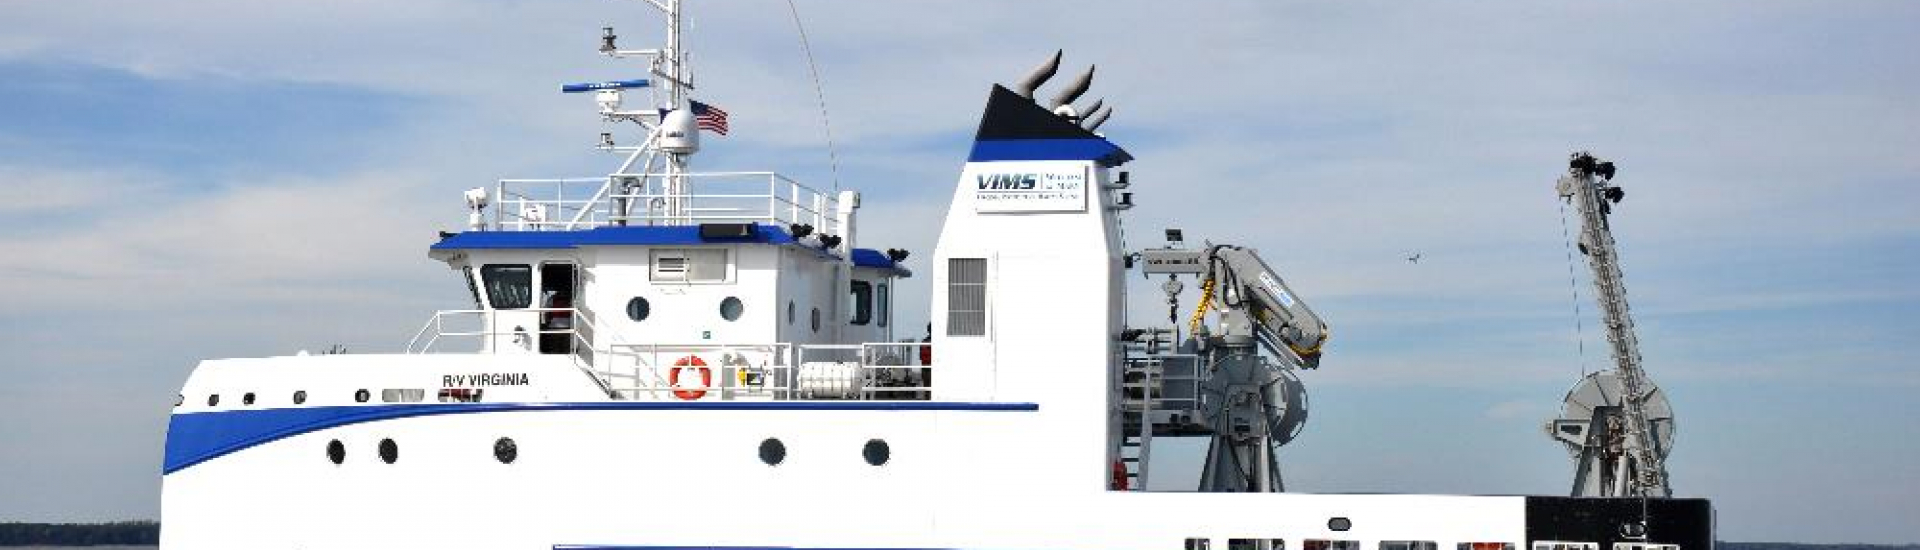 VA Research Vessel Banner